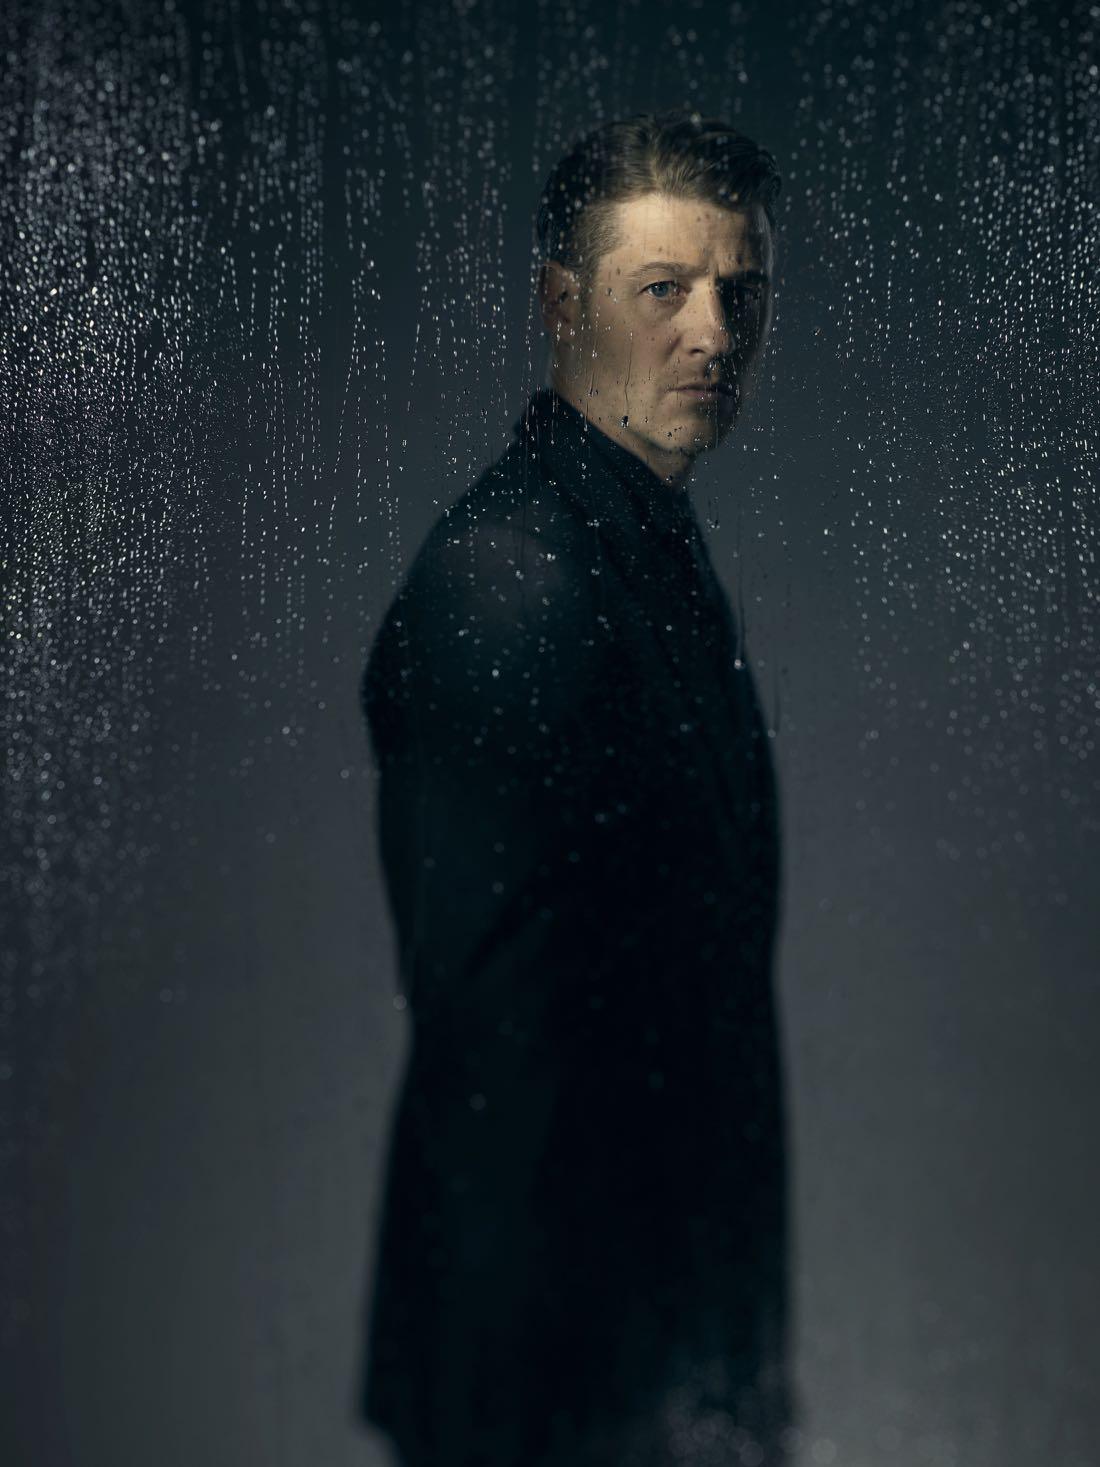 GOTHAM: Ben McKenzie. Season 3 of GOTHAM premieres Monday, Sept. 19 (8:00-9:00 PM ET/PT) on FOX. ©2016 Fox Broadcasting Co. Cr: Kevin Lynch/FOX